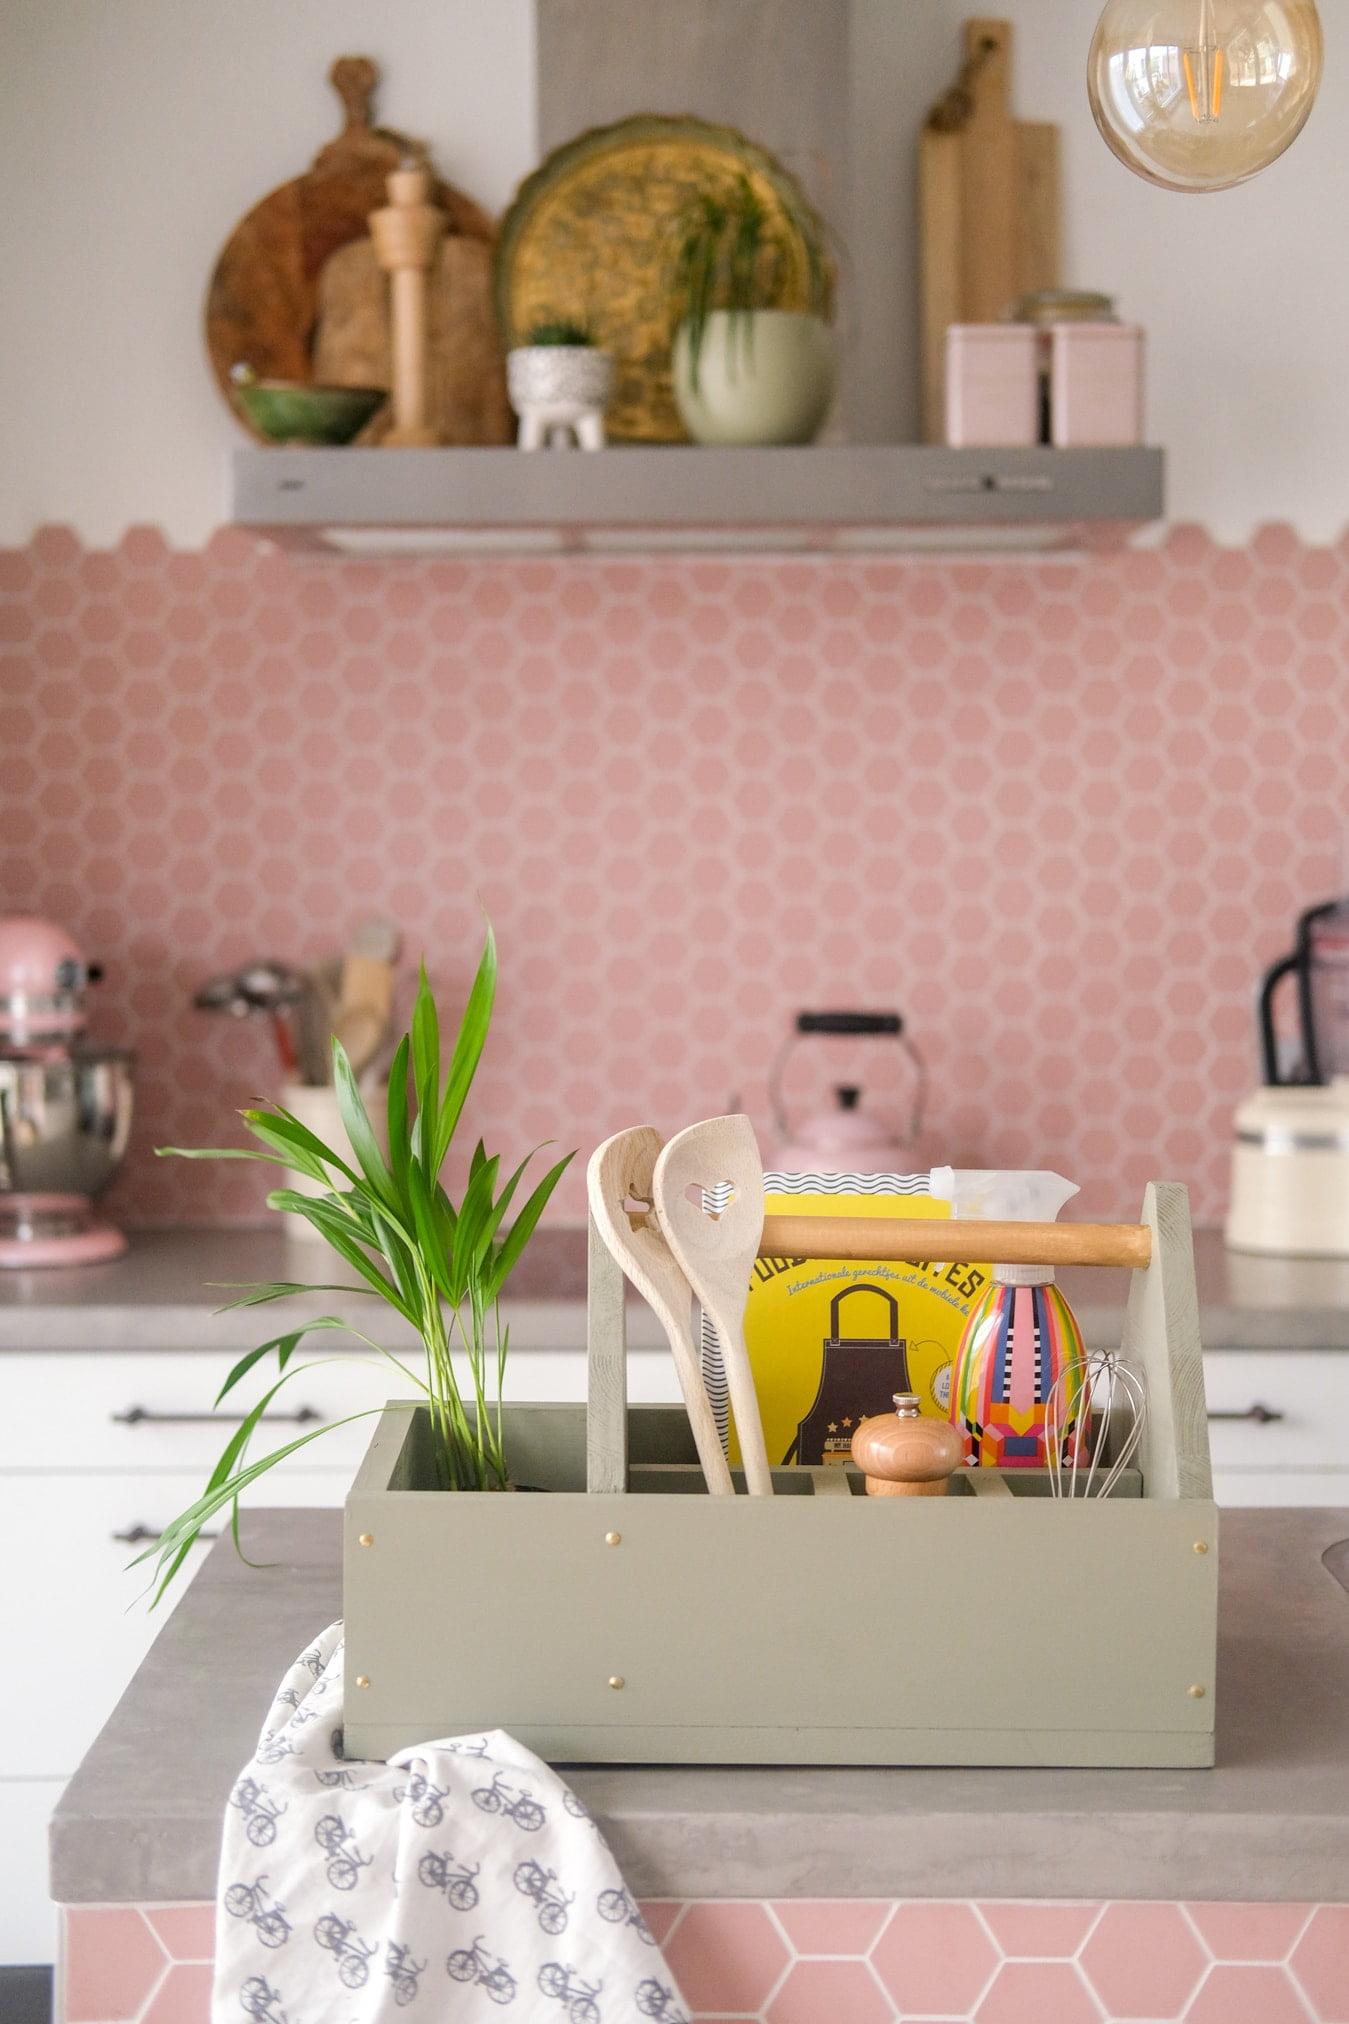 toolbox keuken styling